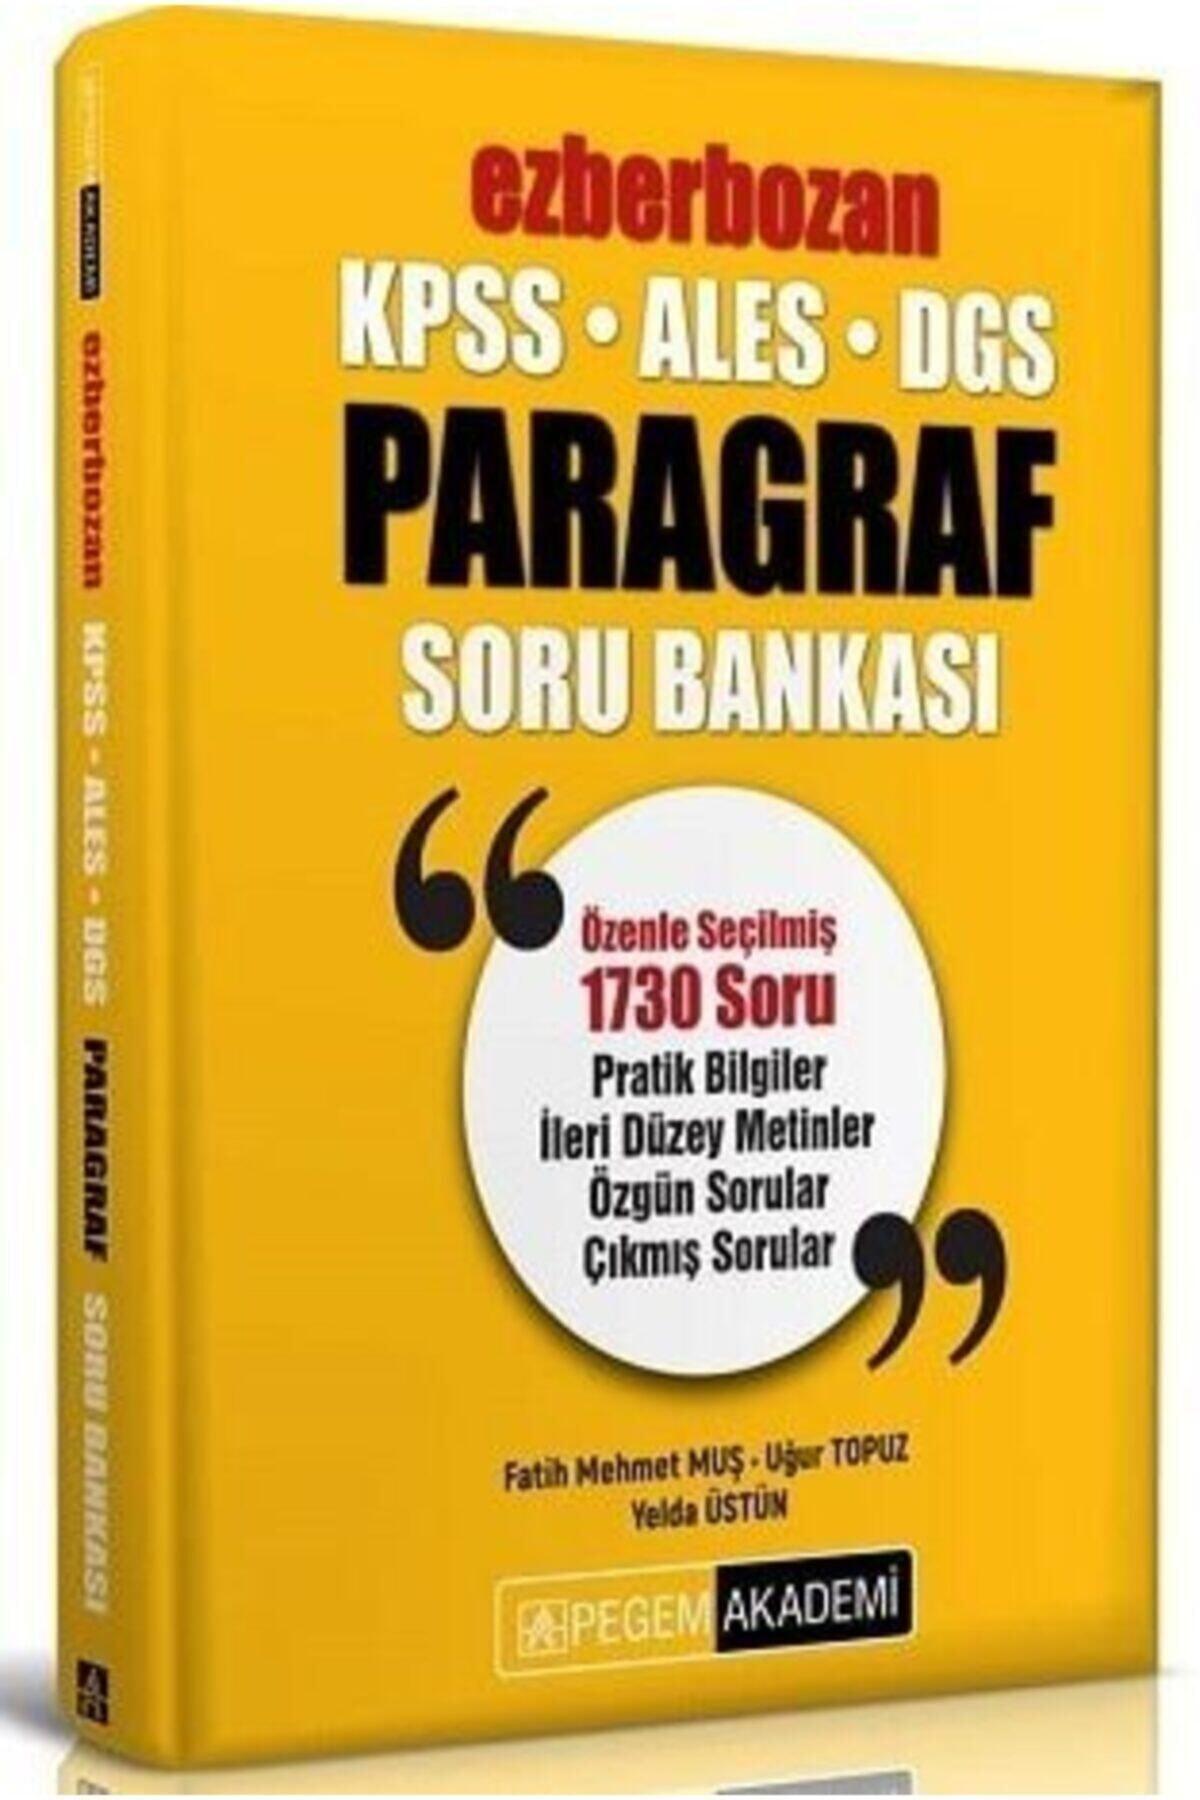 Pegem Yayınları 2022 Kpss Ales Dgs Ezberbozan Paragraf Soru Bankası